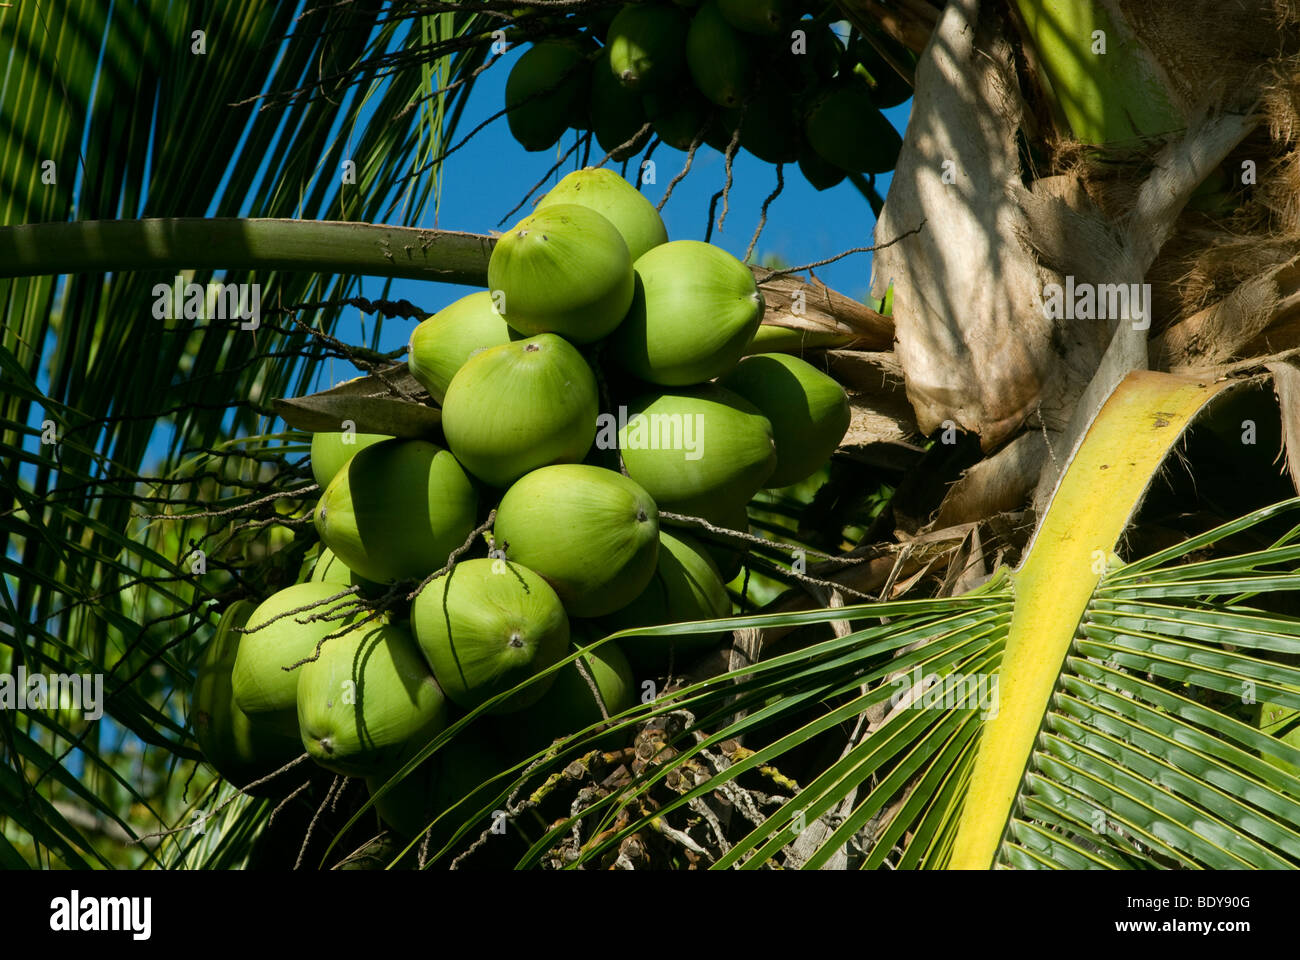 Coconut Palm (Cocos nucifera) with coconuts. - Stock Image